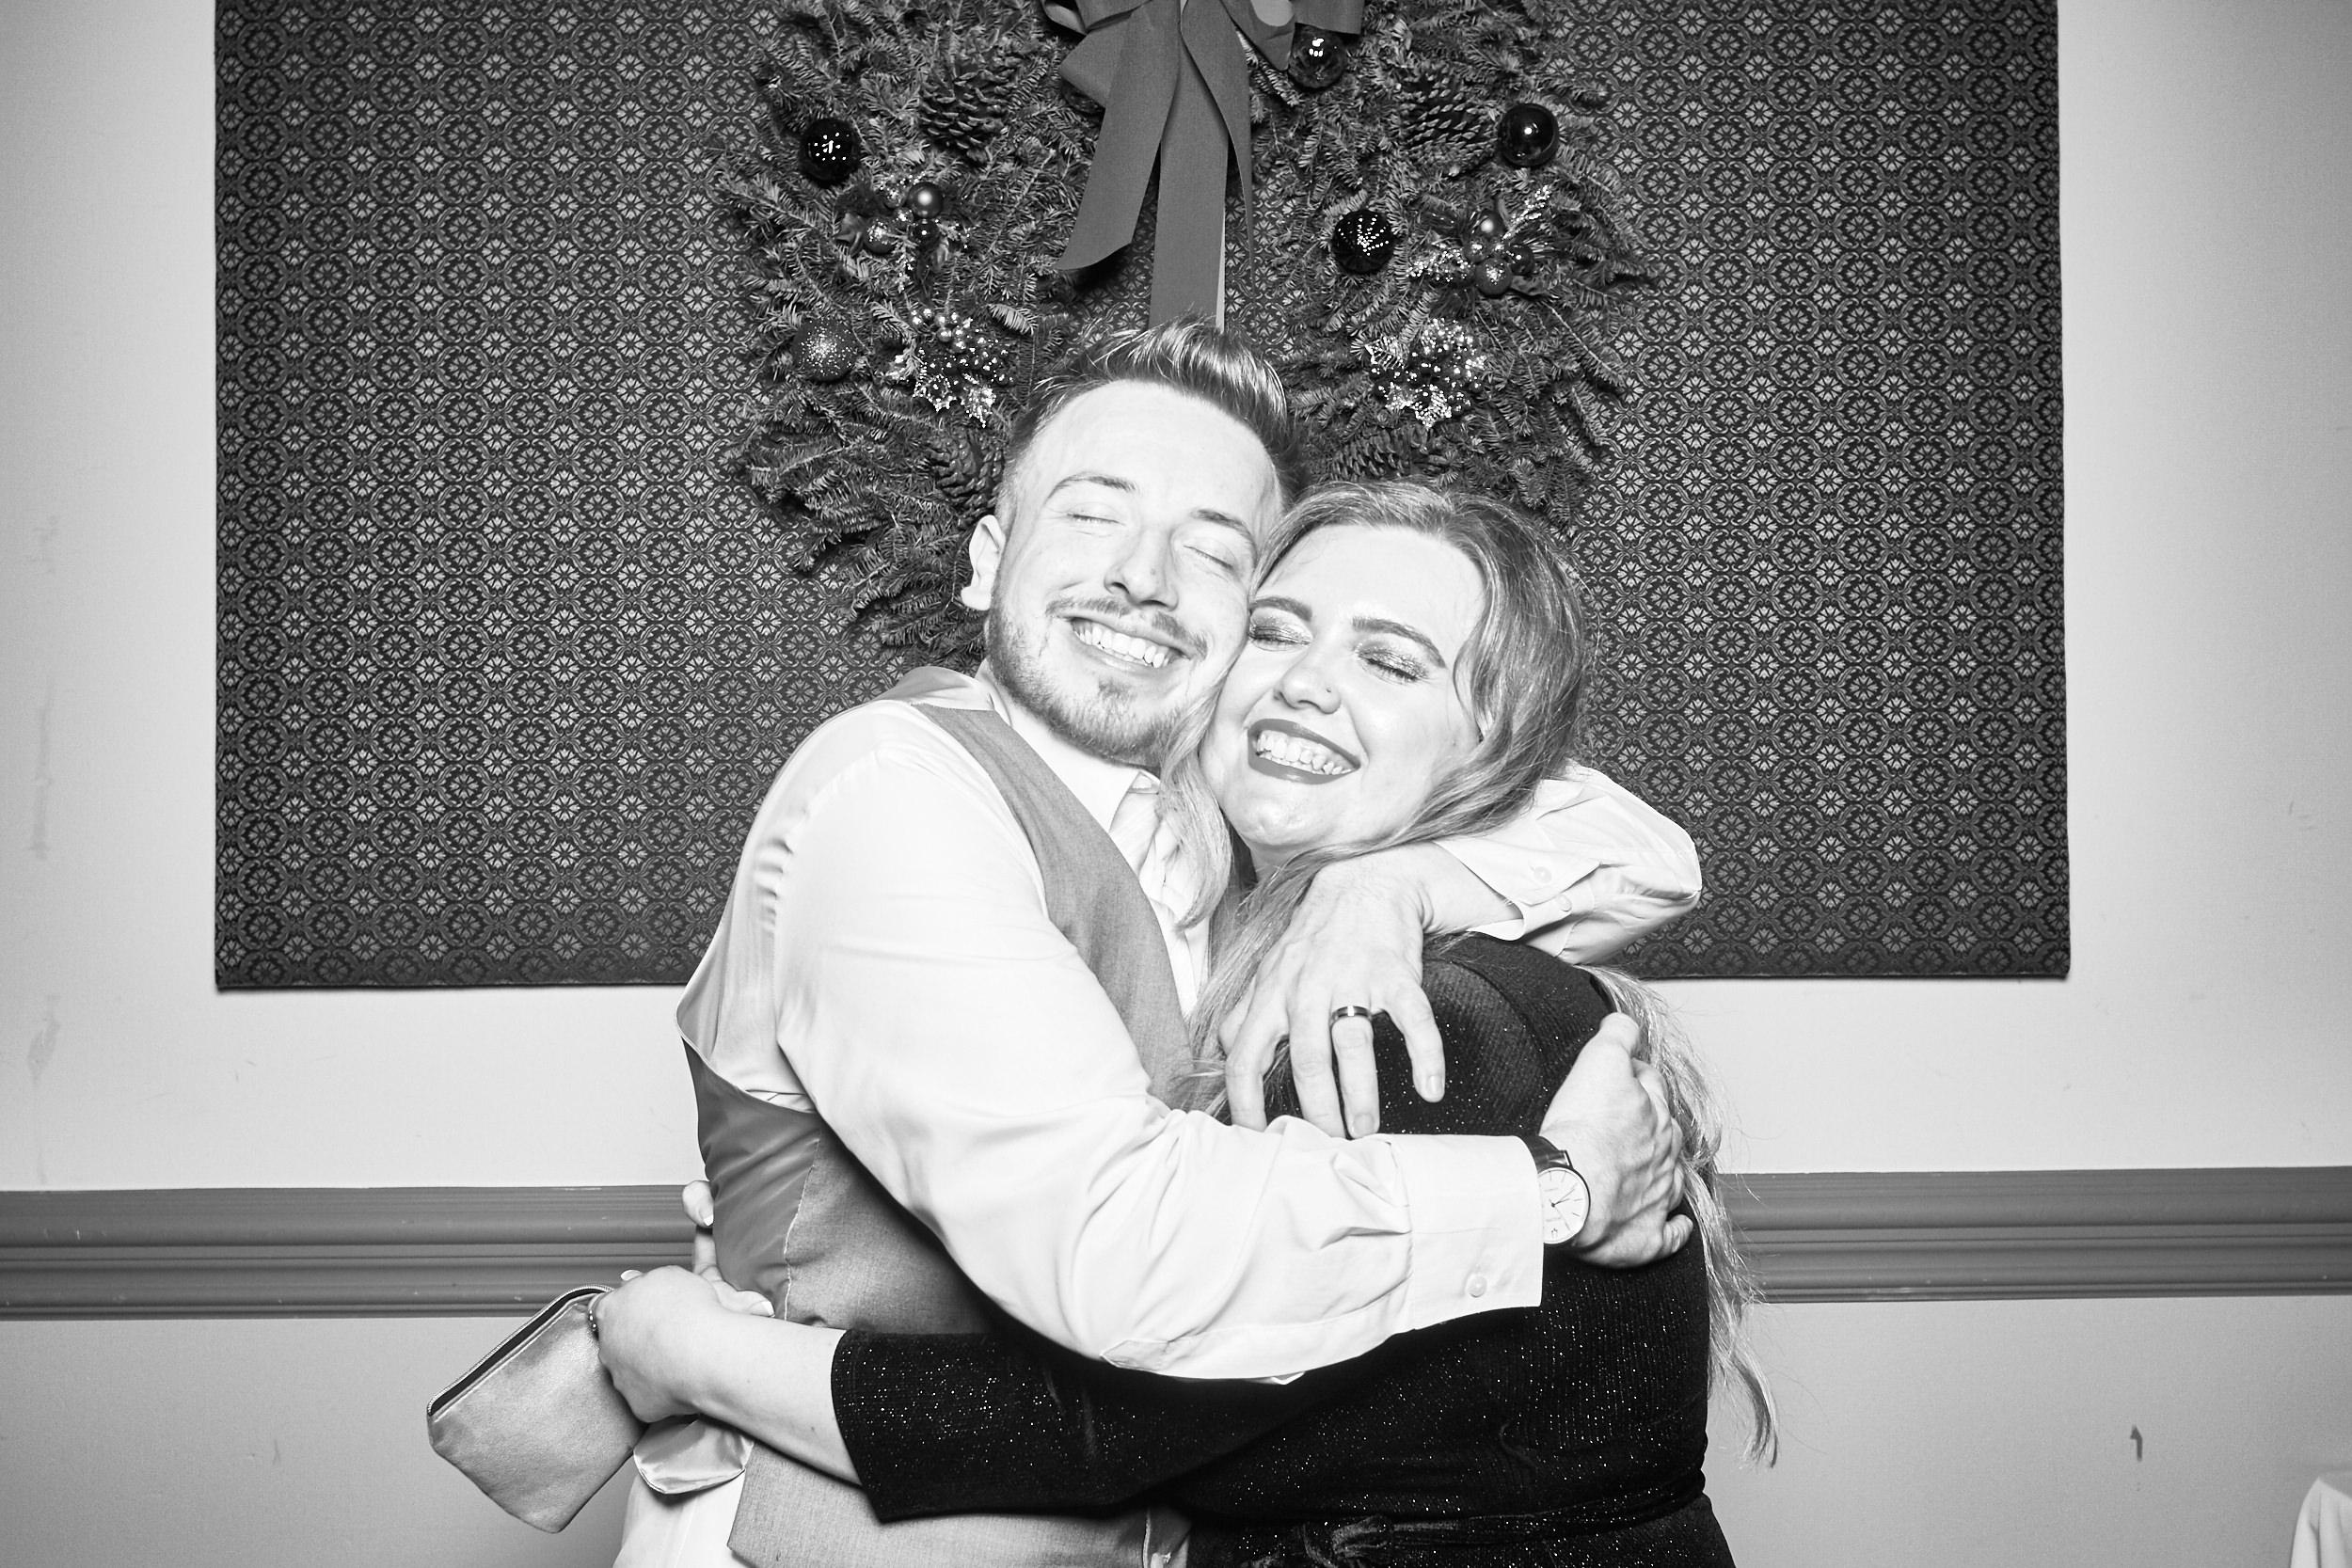 Alexa-James-Wedding-Photo-Booth992.jpg